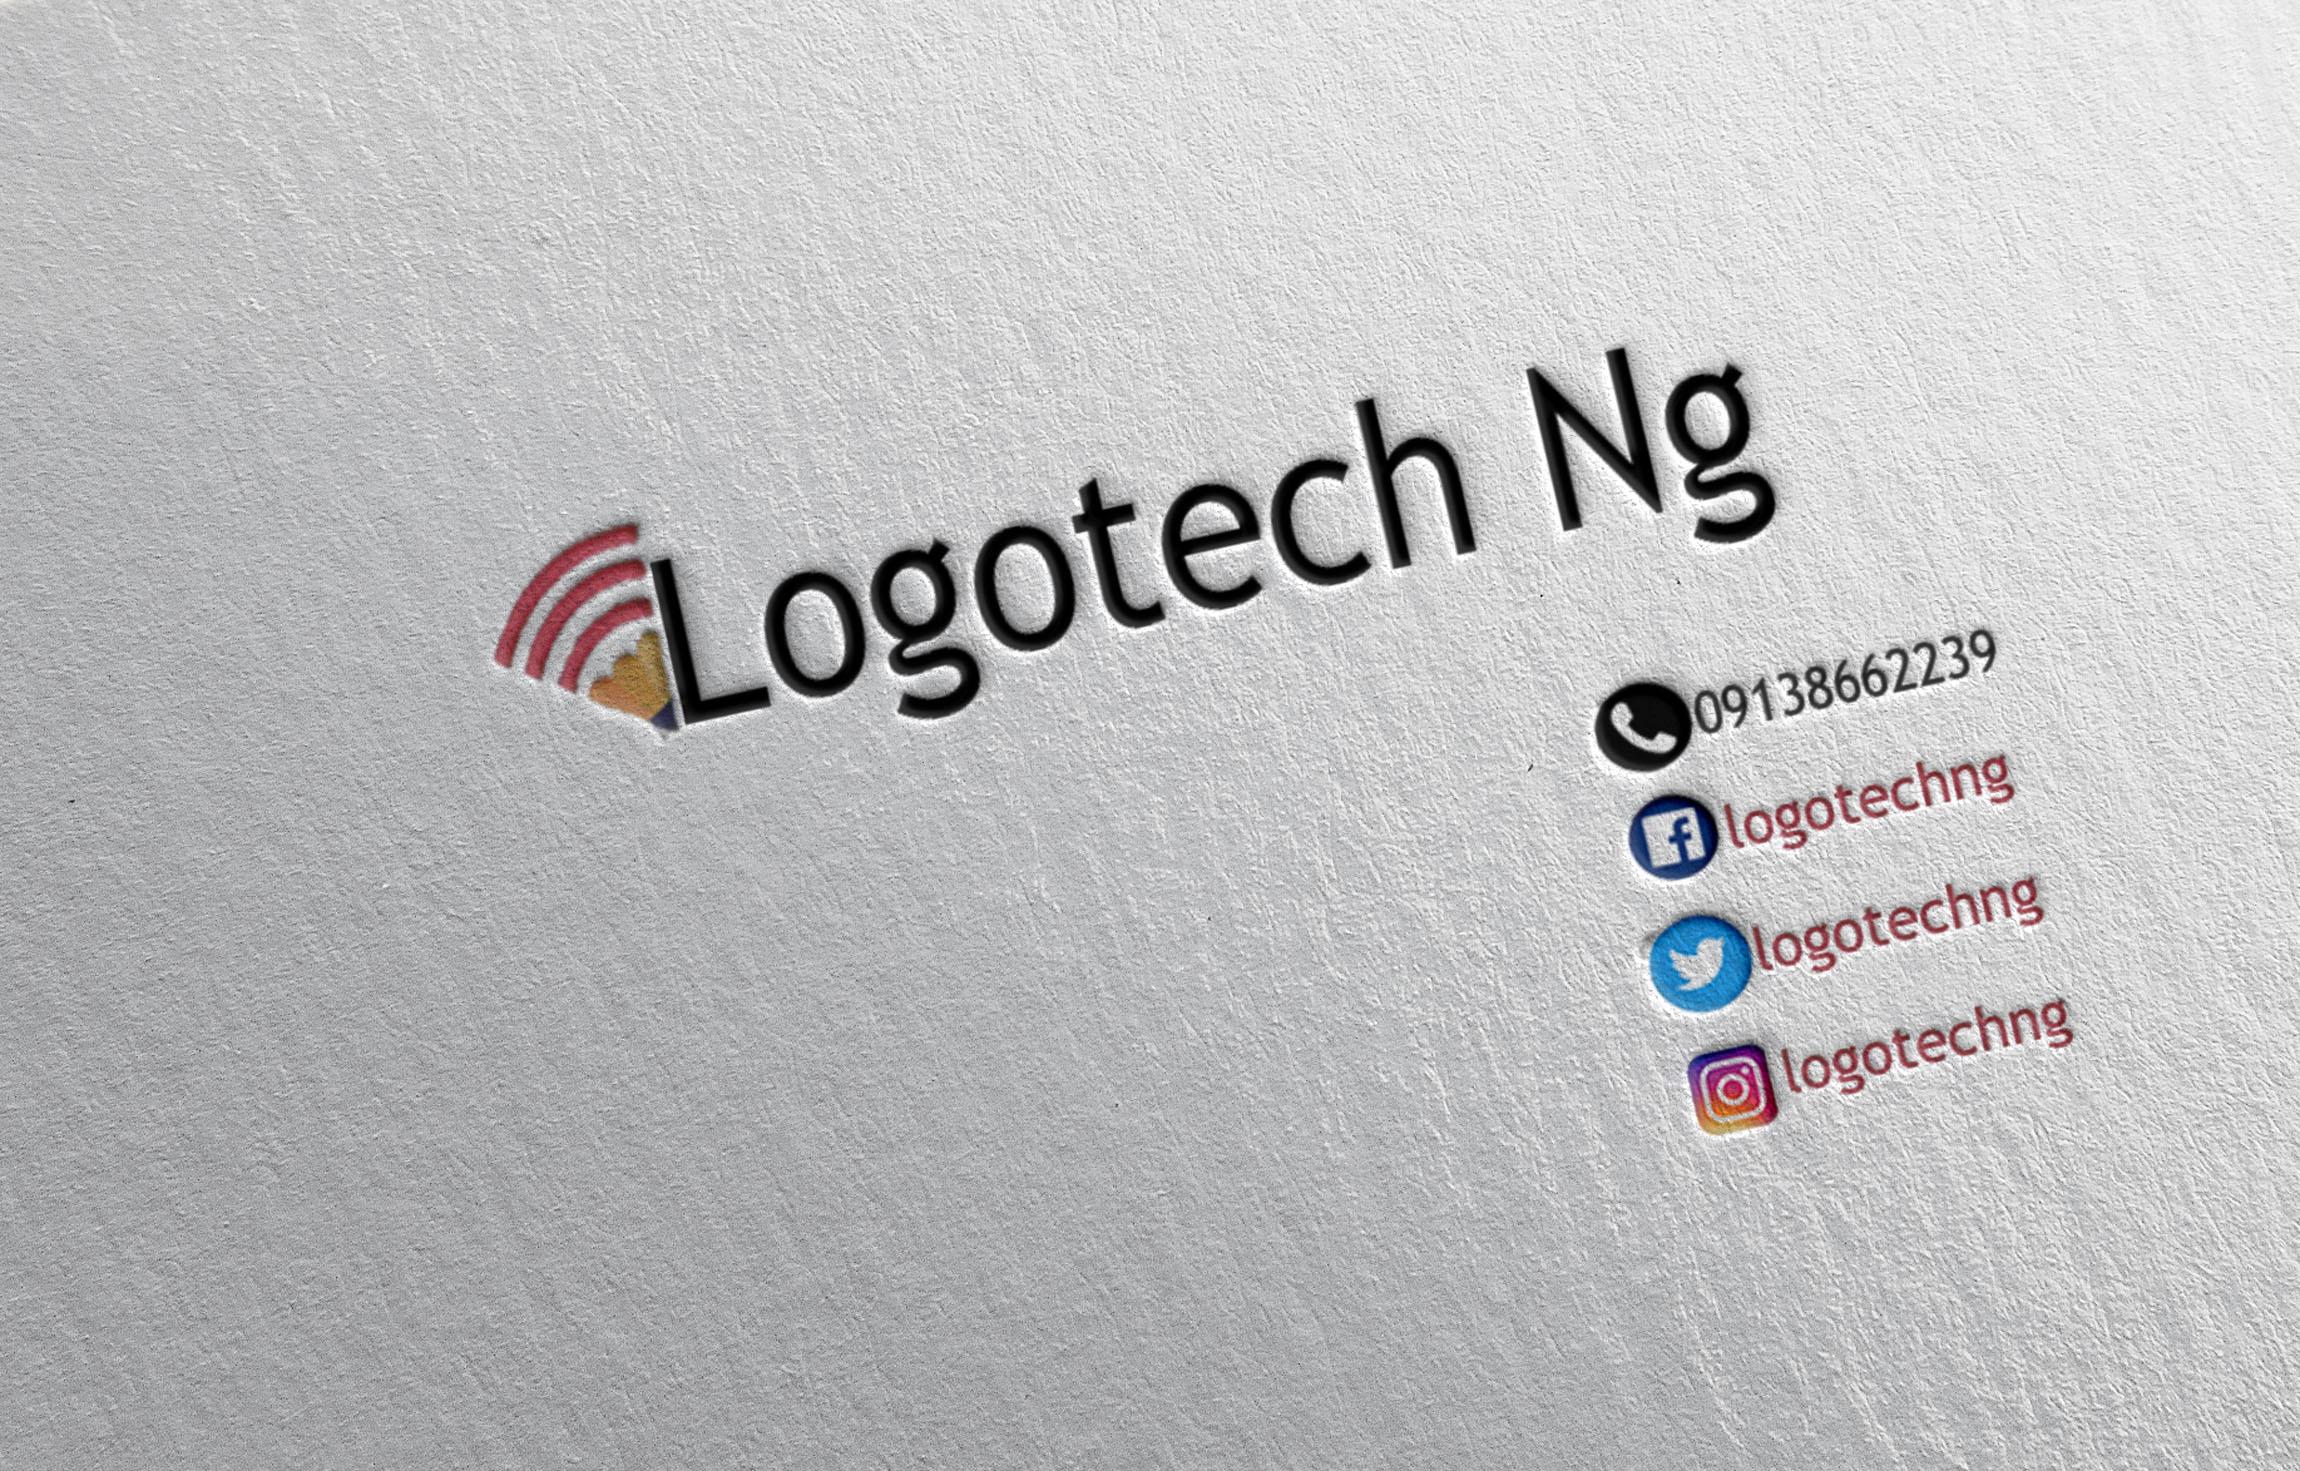 Logotech Ng (Web Design and Digital), a chatbot developer